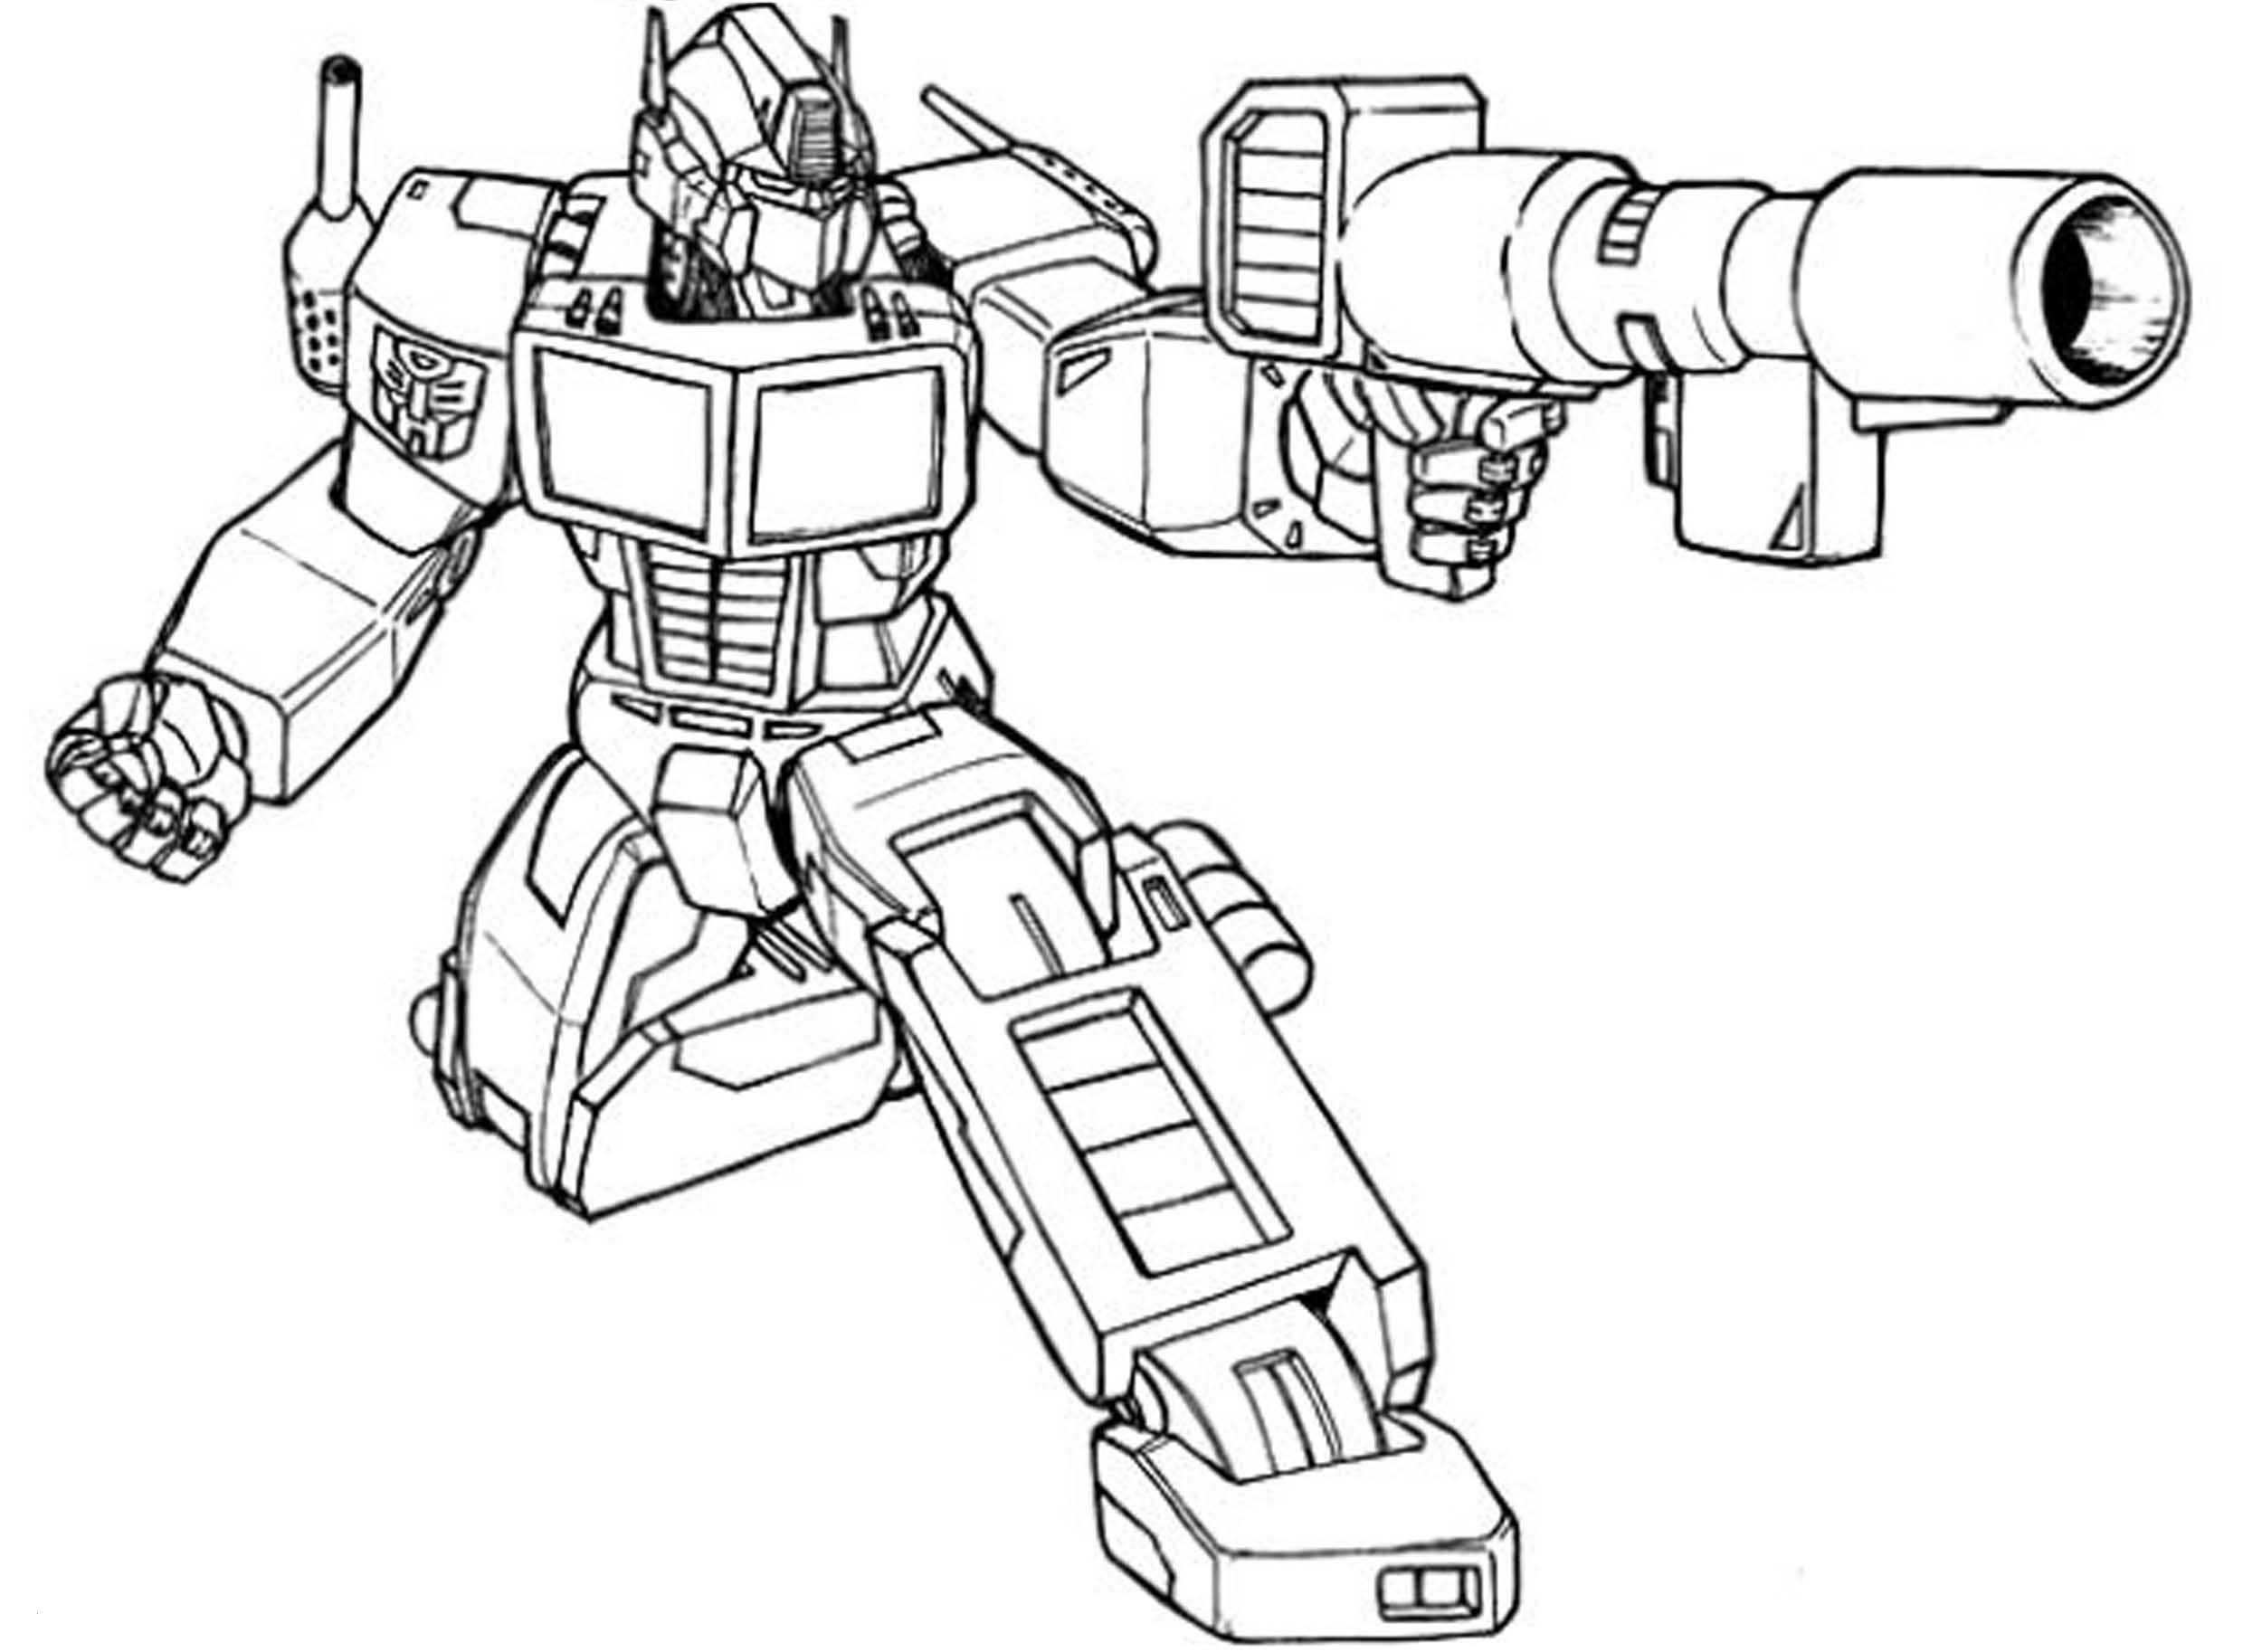 Megatron Coloring Pages Best Coloring Pages For Kids In 2020 Transformers Coloring Pages Bee Coloring Pages Coloring Pages